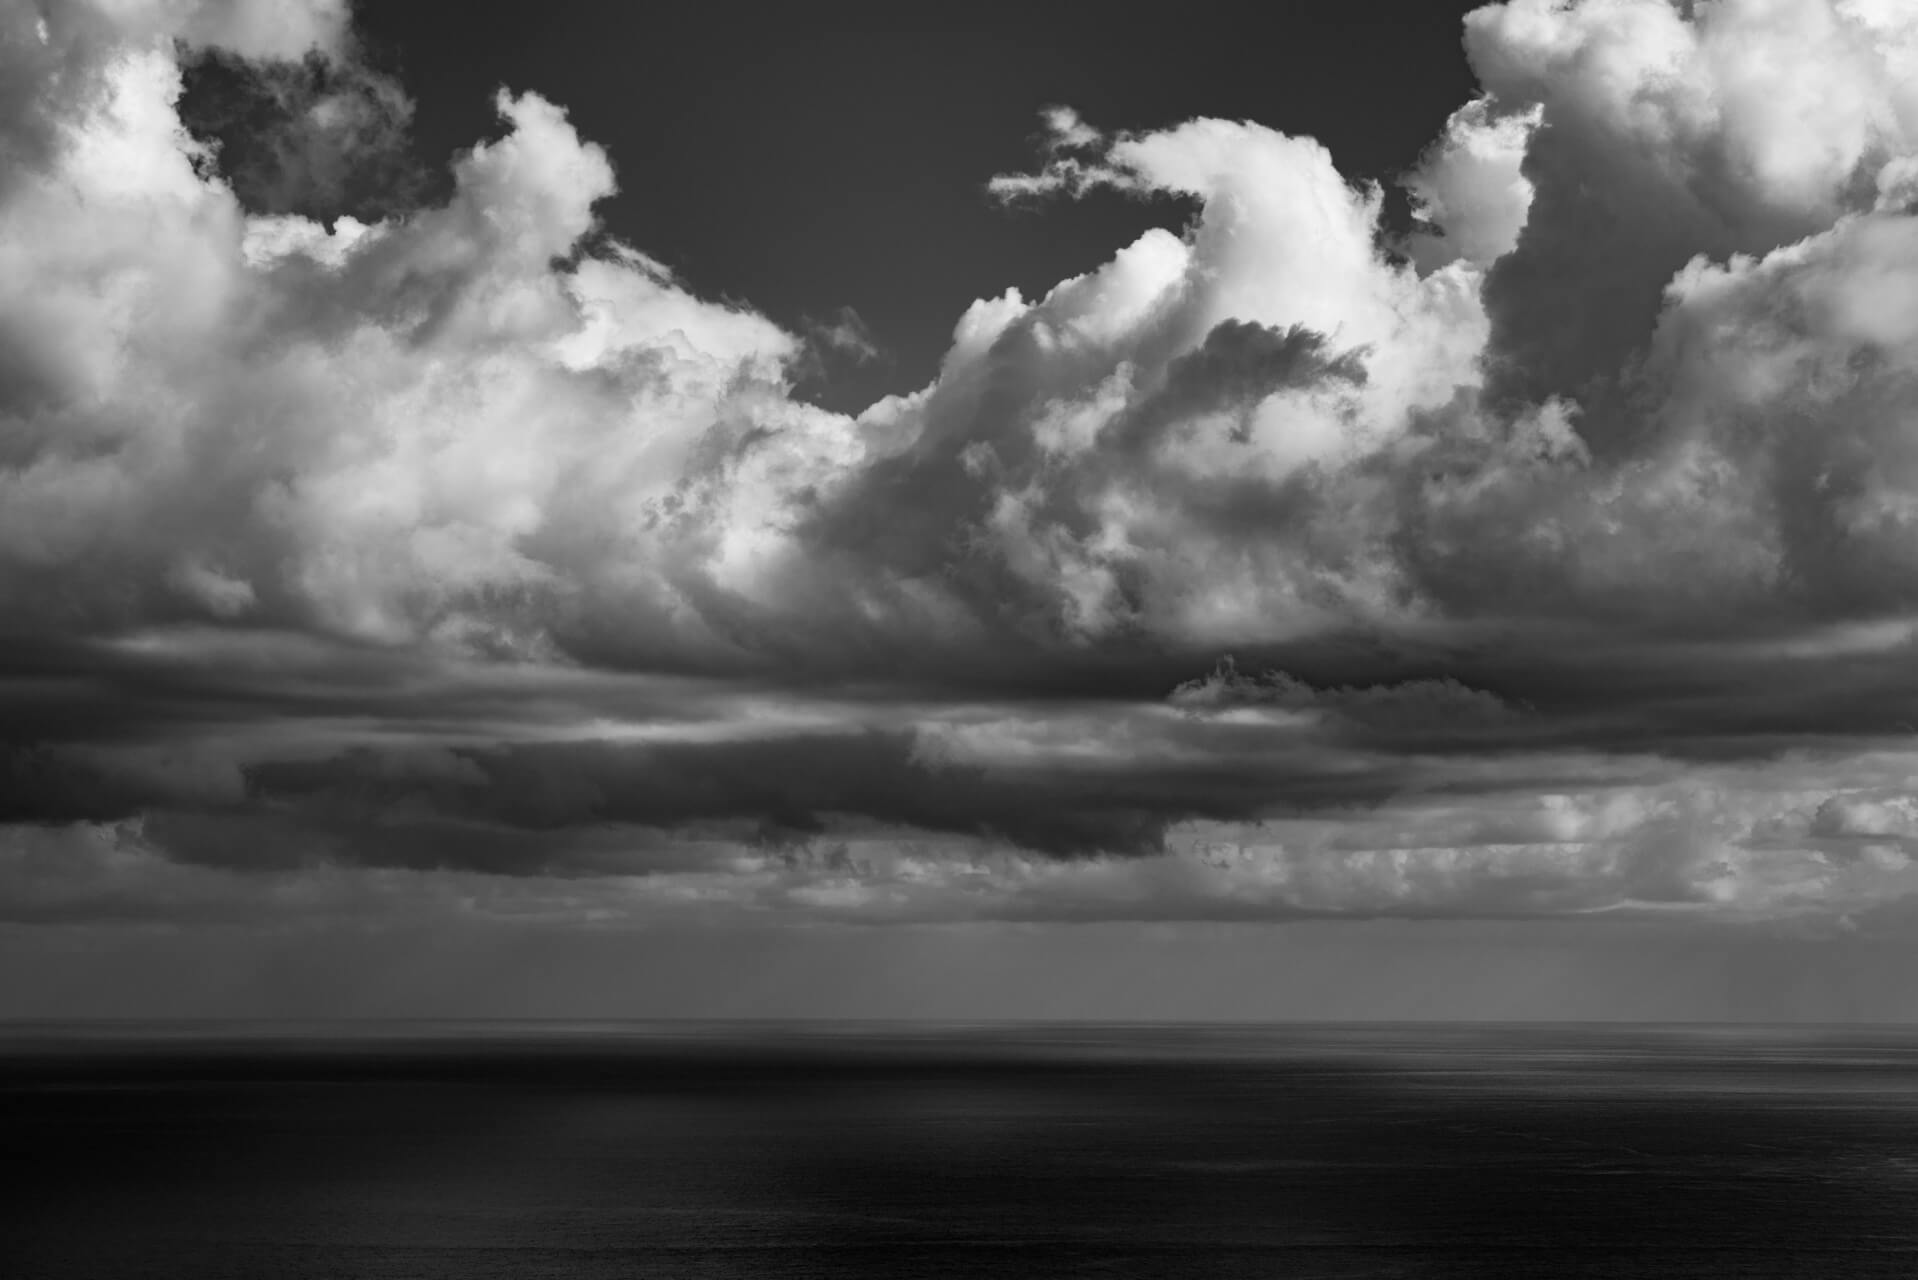 Yakushima, Japan, Fotografie monochrom, Steffen Lohse-Koch